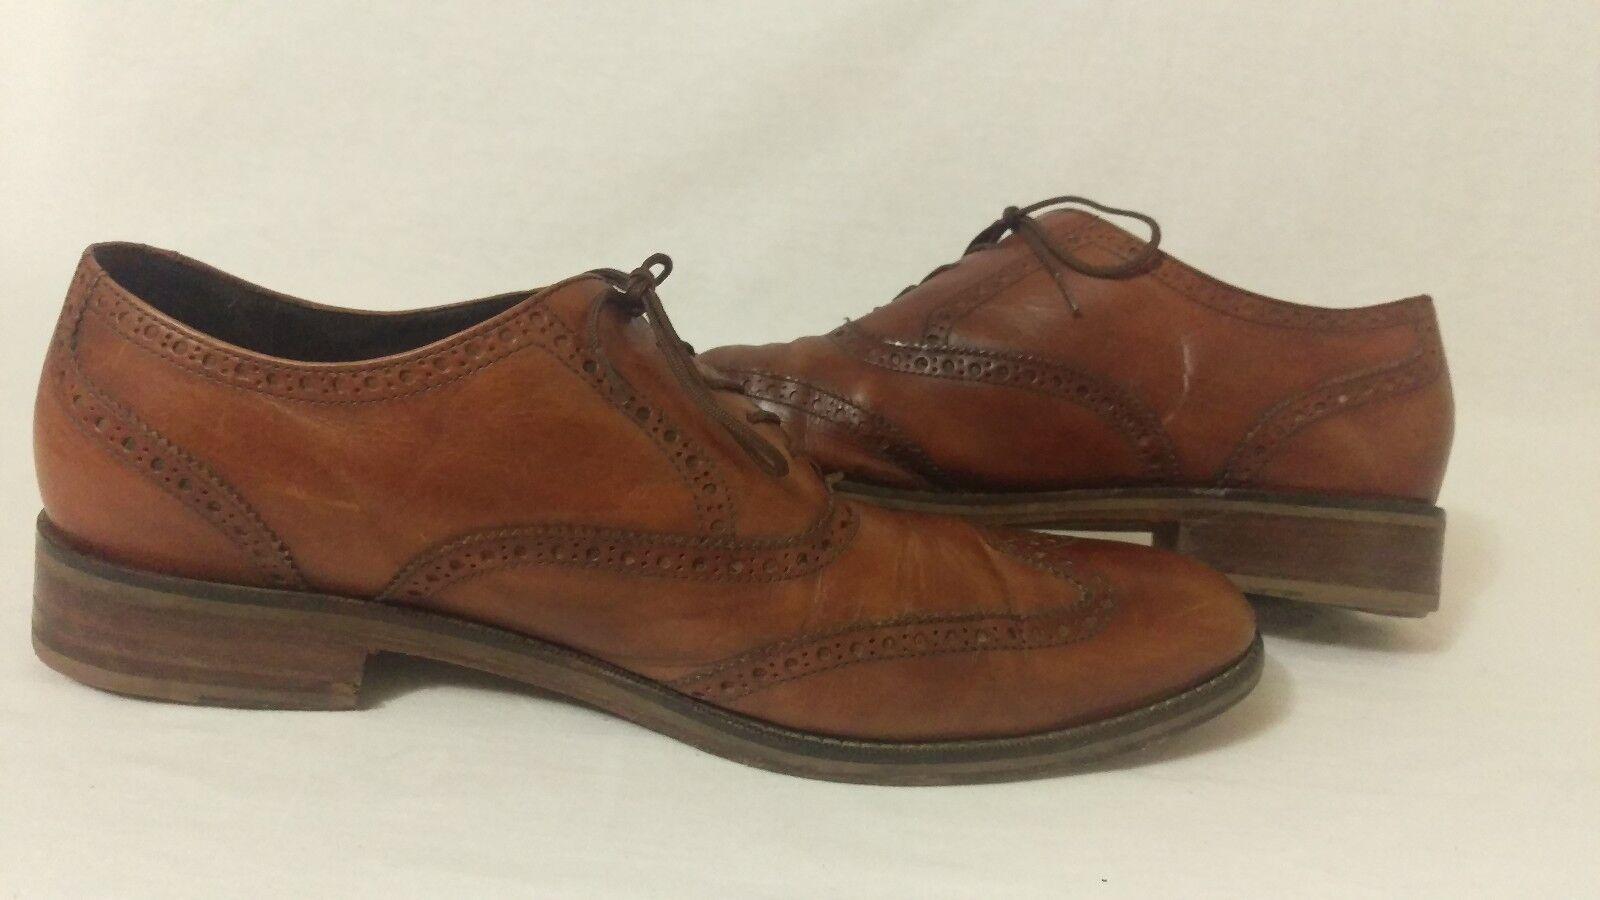 Cole Haan Shoes Air Madison Madison Air British Tan Wingtip Oxford Shoes Uomo 13 m 699b87